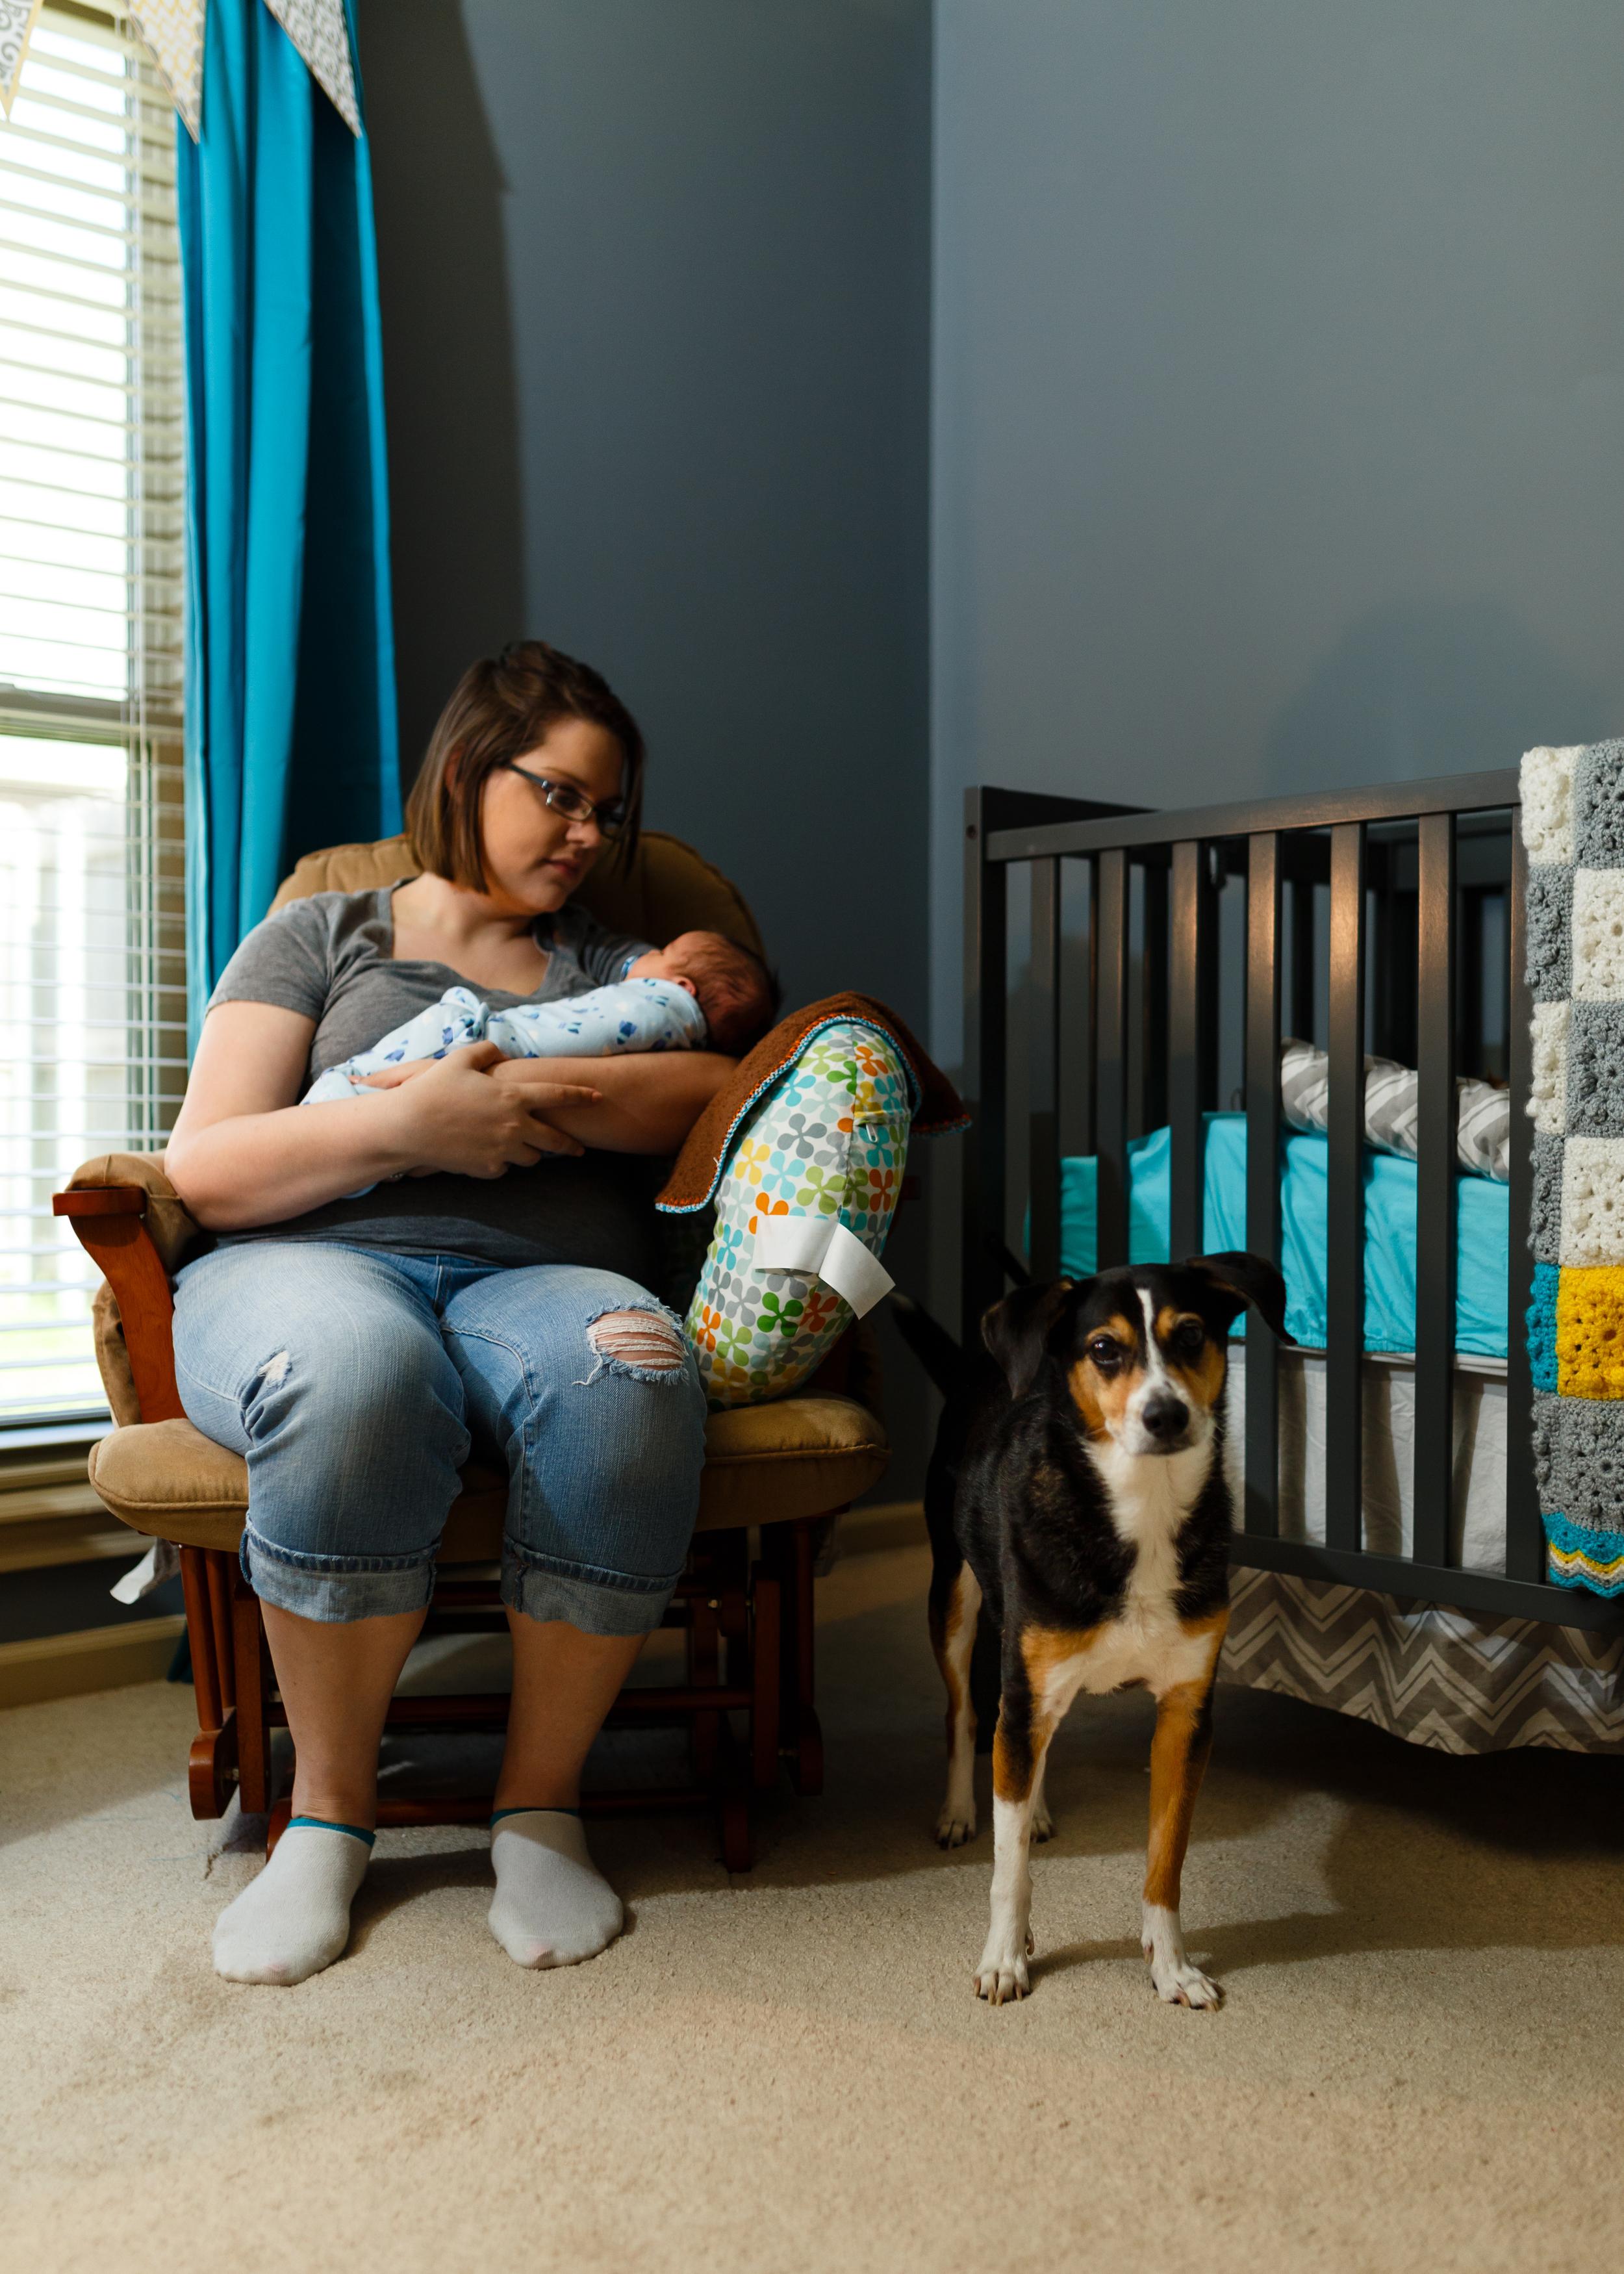 Newborn-baby-lifestyle-portrait-lafayette-broussard-youngsville-photographer-16.jpg